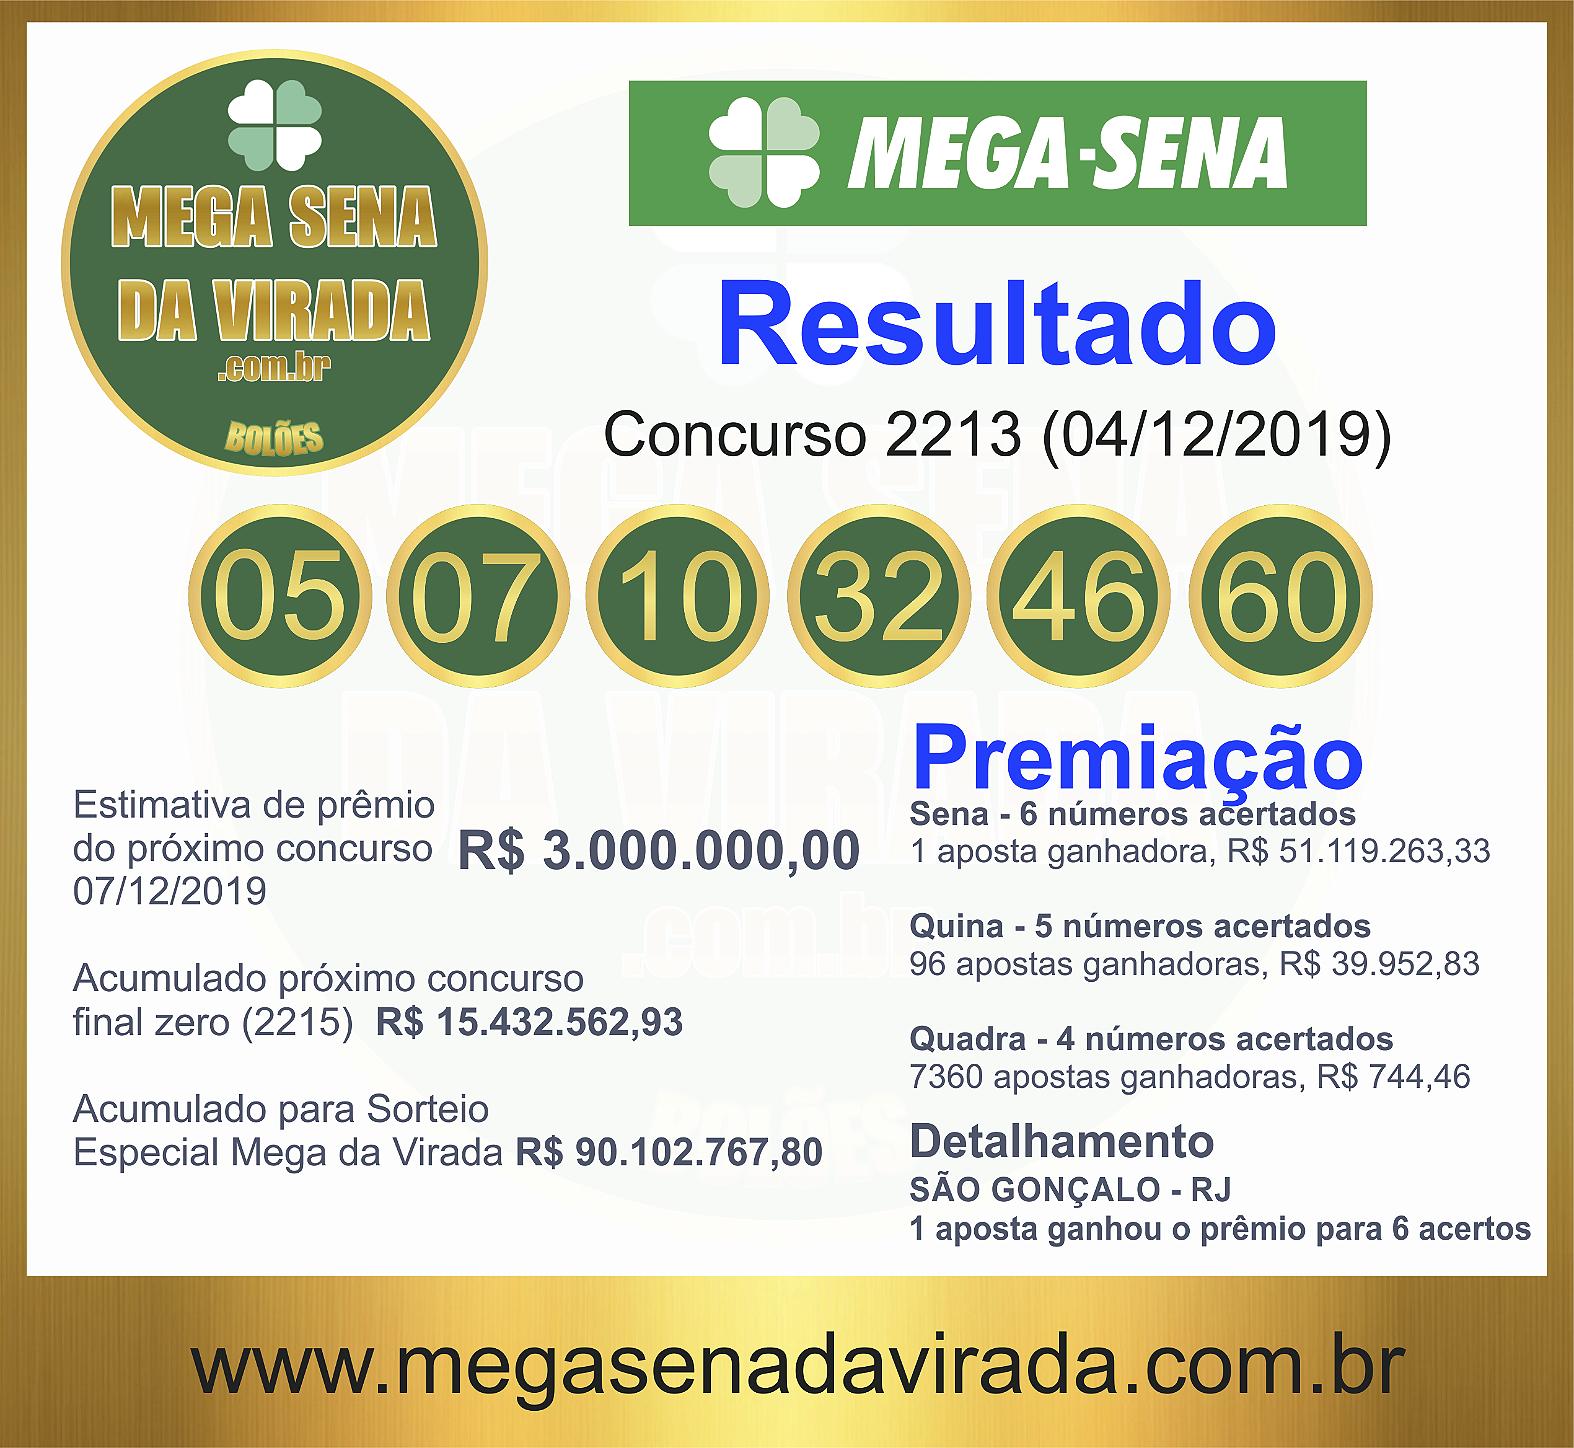 Mega Sena Concurso 2213 04/12/2019